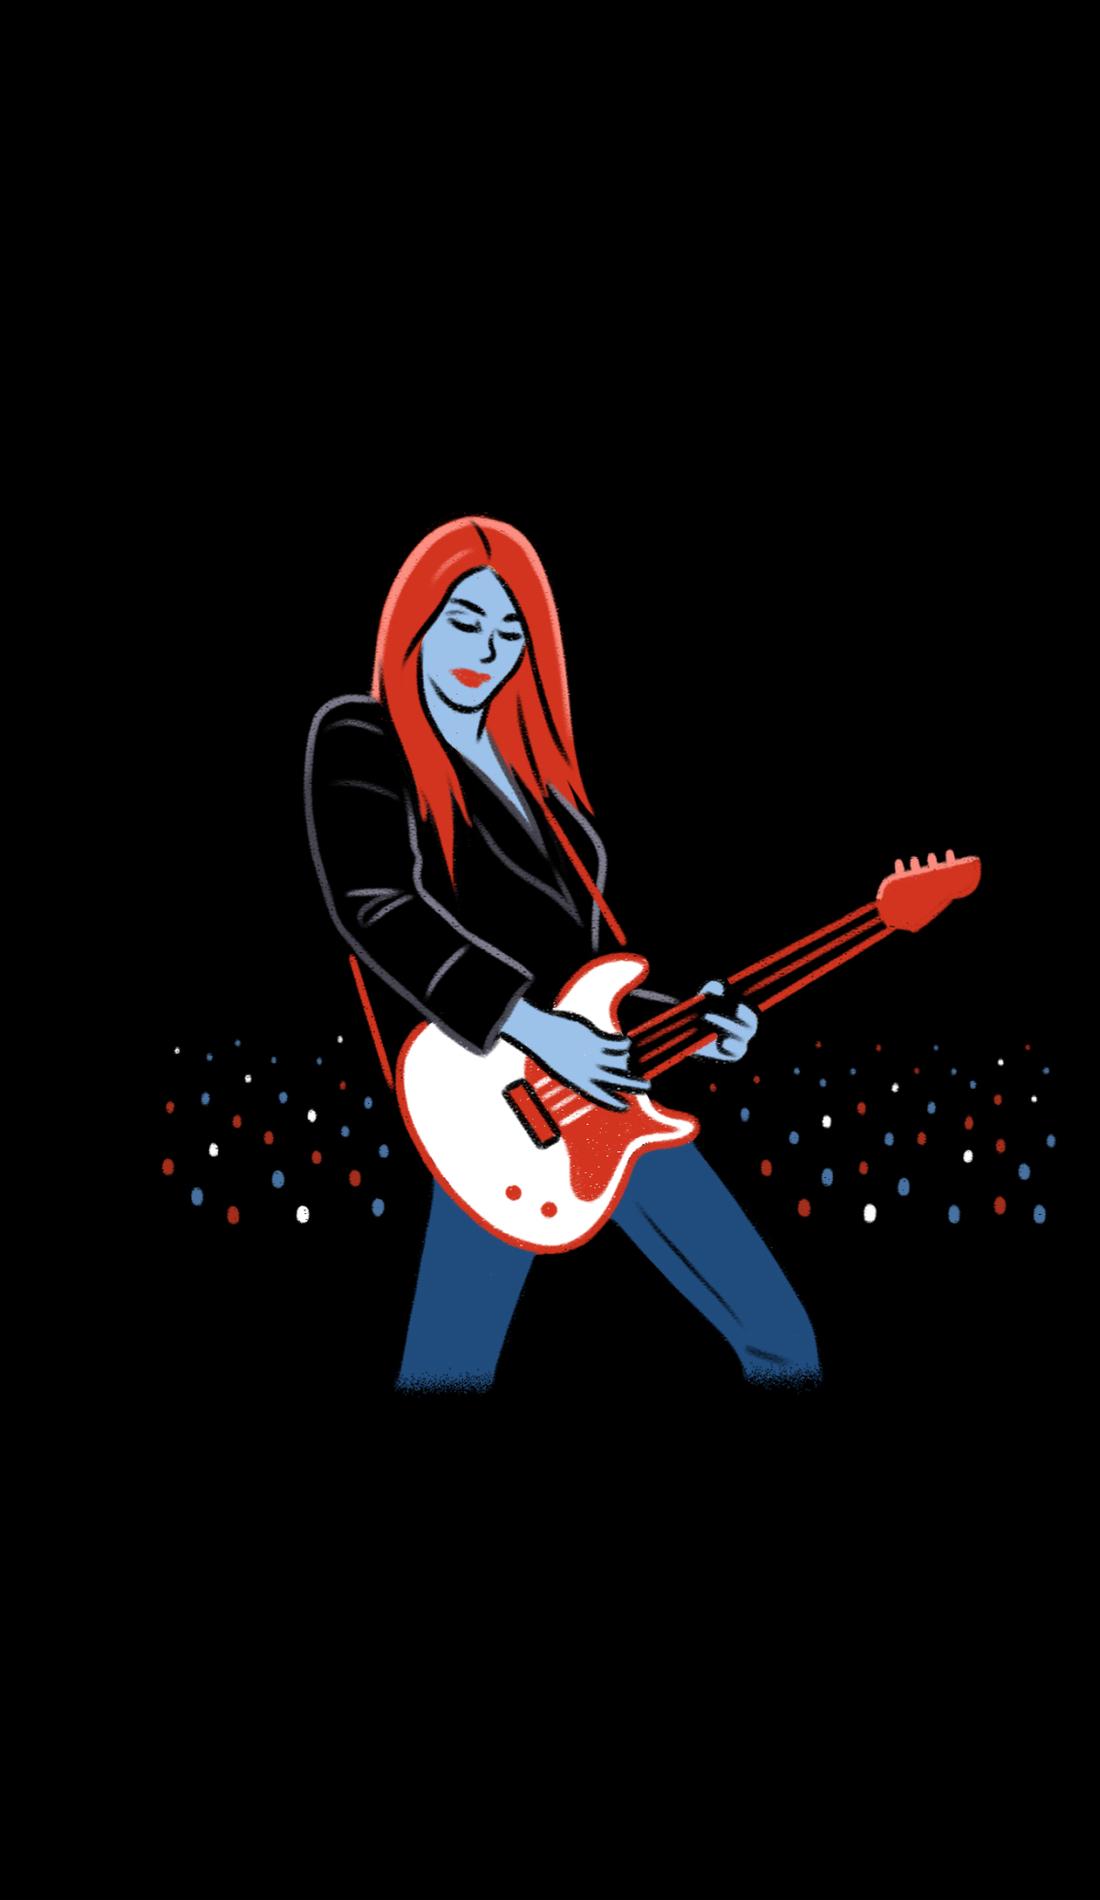 A DaniLeigh live event